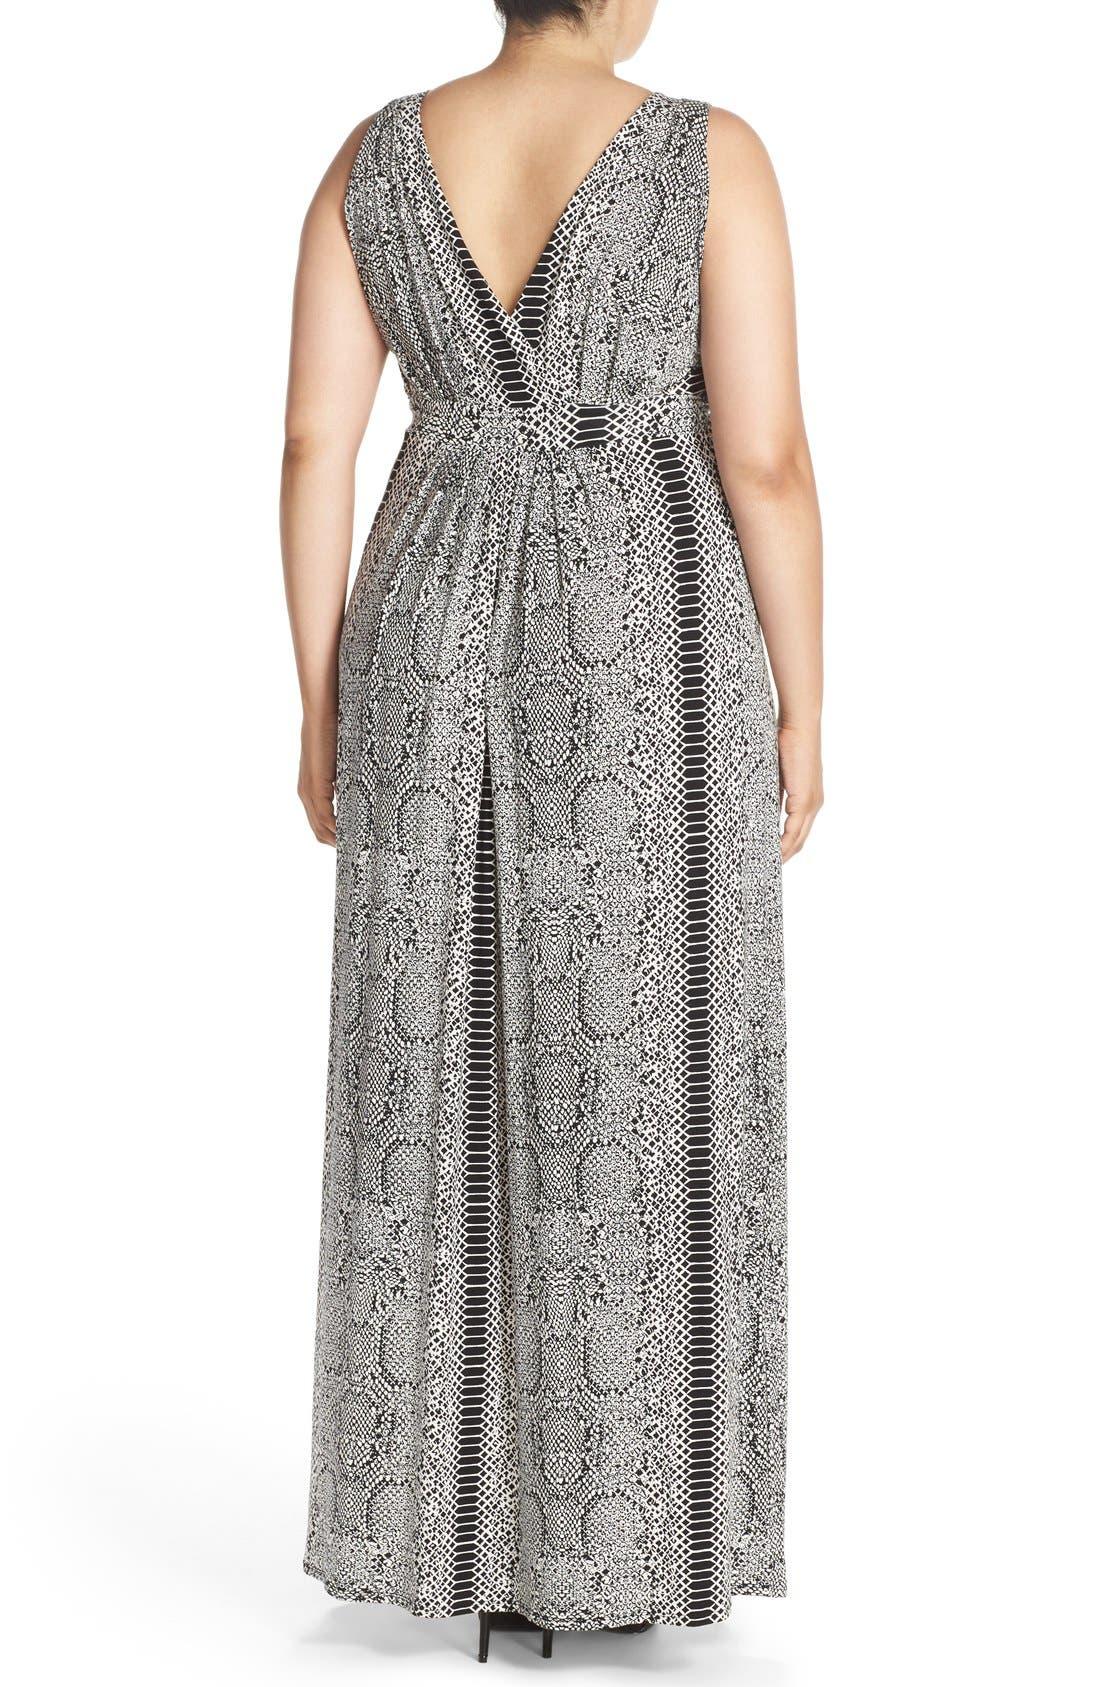 Chloe Empire Waist Maxi Dress,                             Alternate thumbnail 42, color,